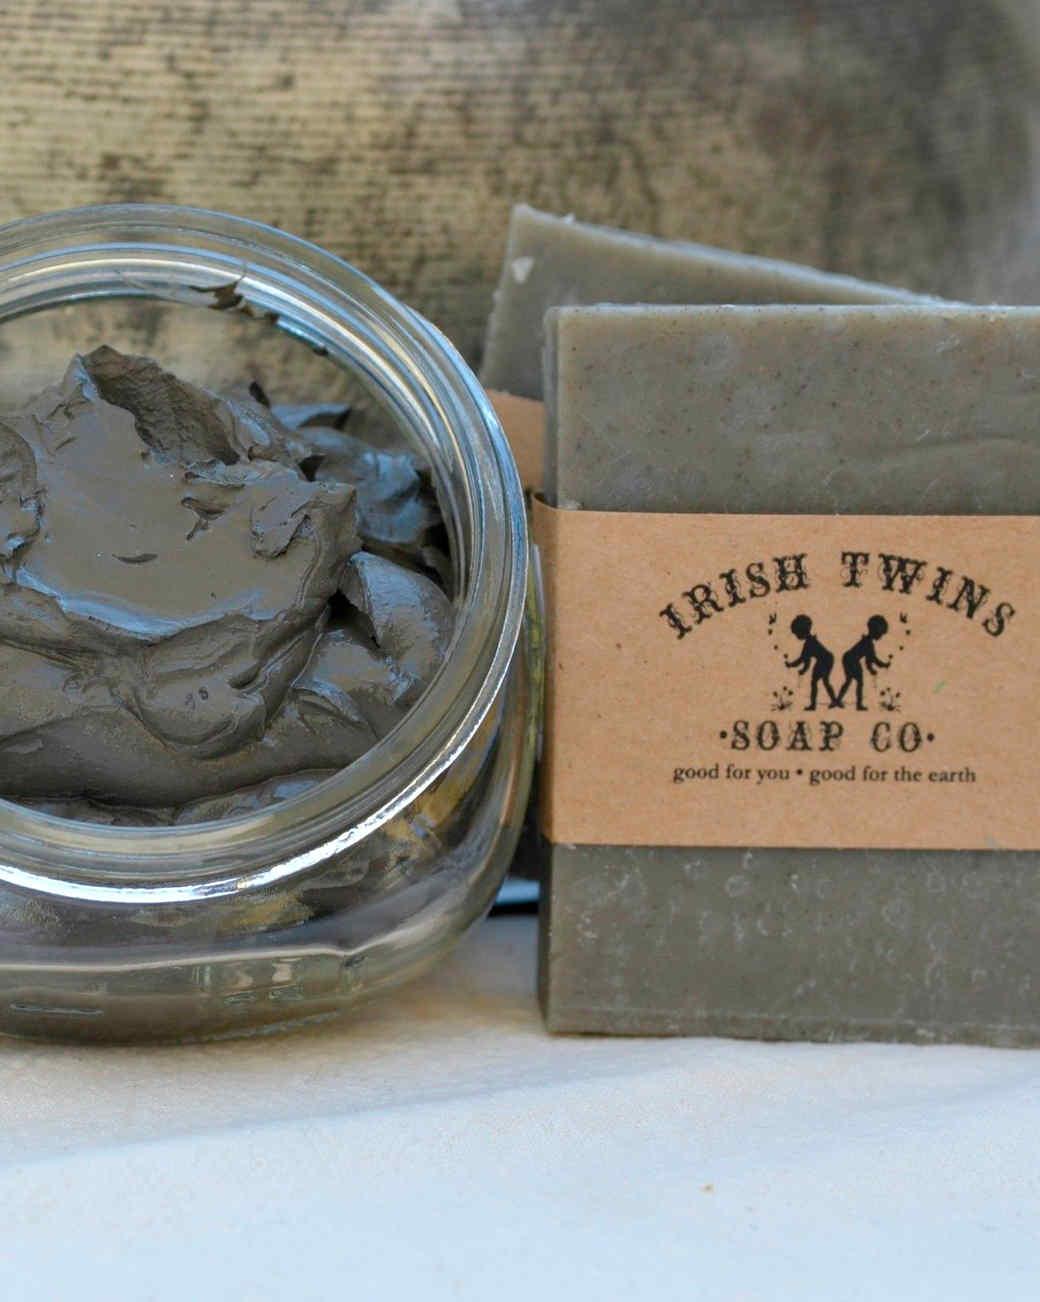 irish-twins-soap-company-dead-sea-mud-soap-0915.jpg